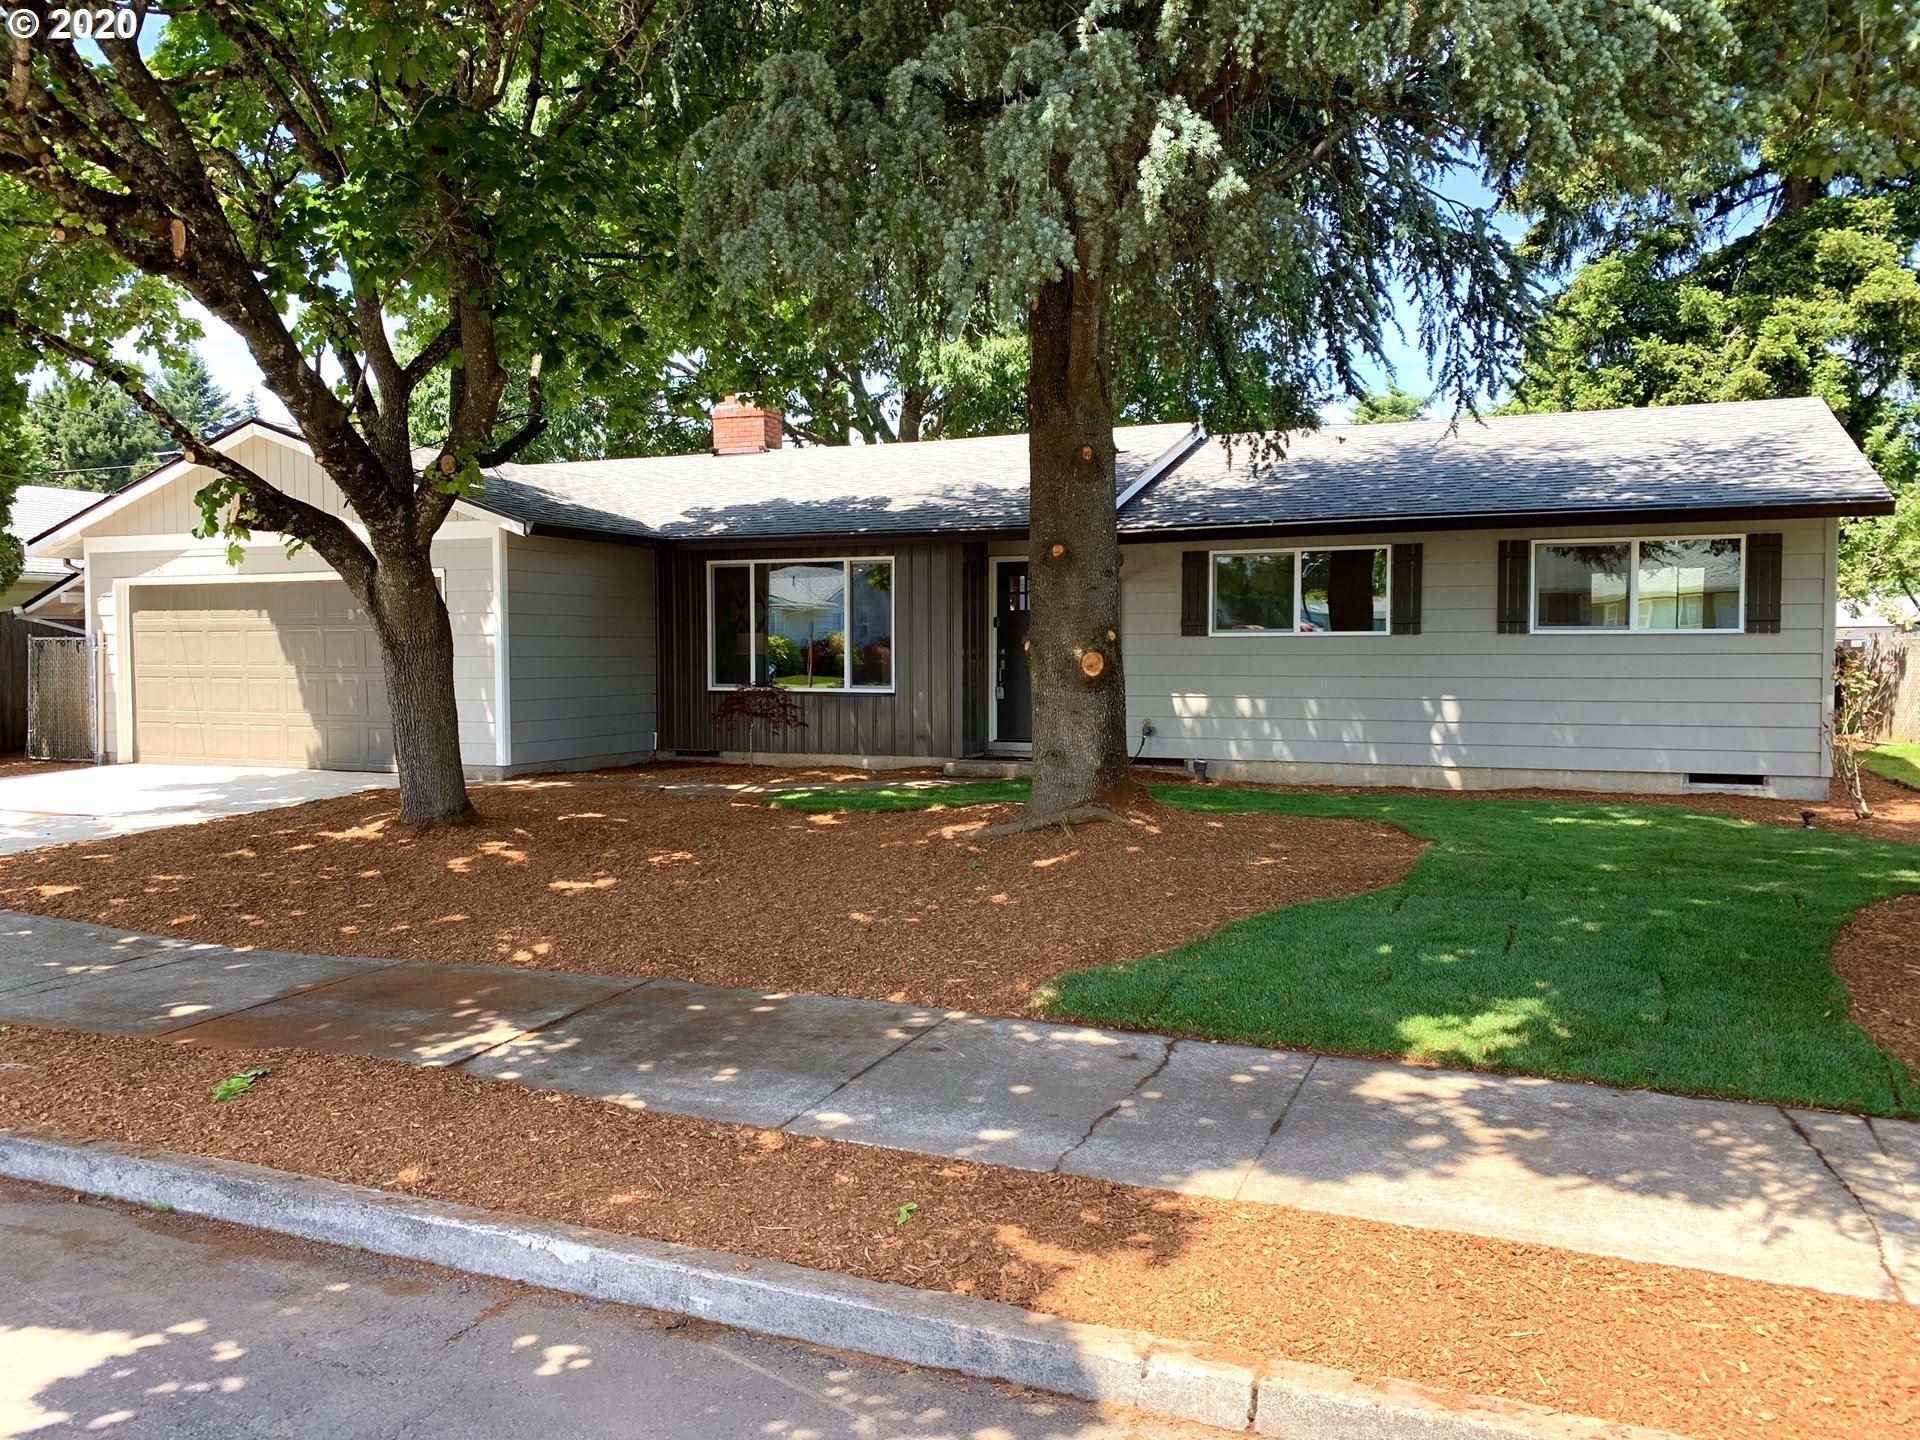 19657 NE MULTNOMAH ST, Portland, OR 97230 - MLS#: 20690722